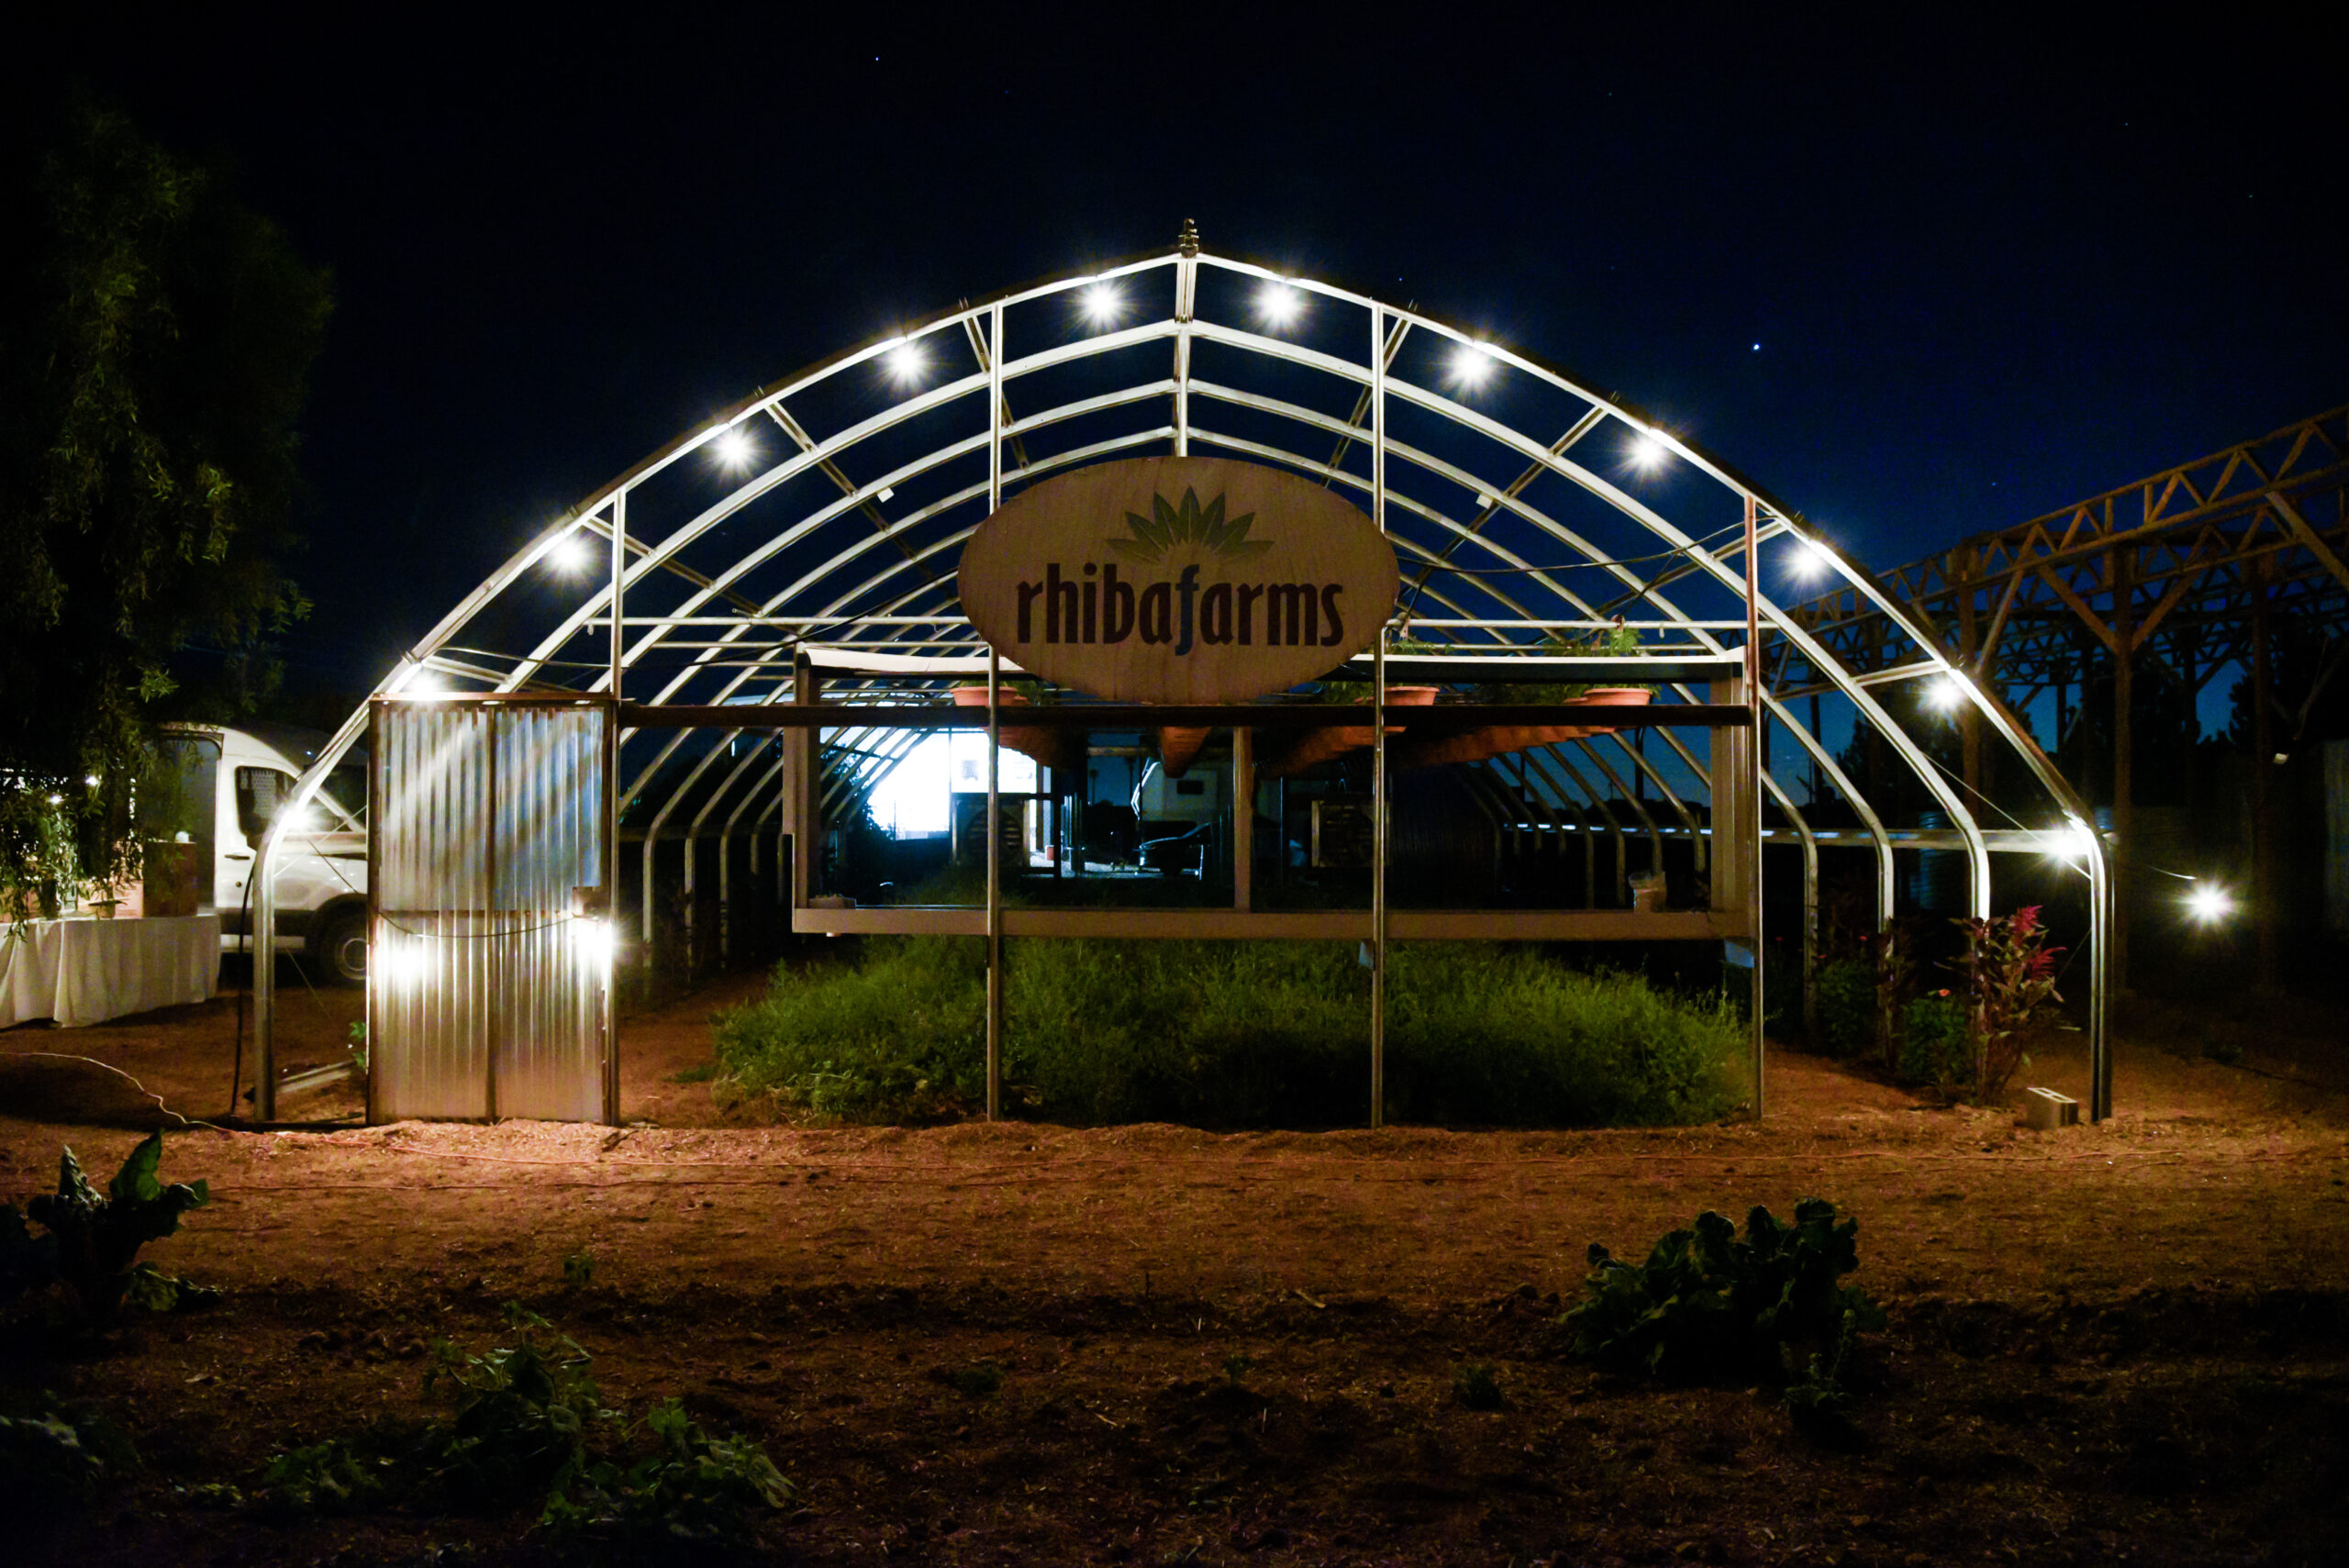 Rhiba Farms at night time